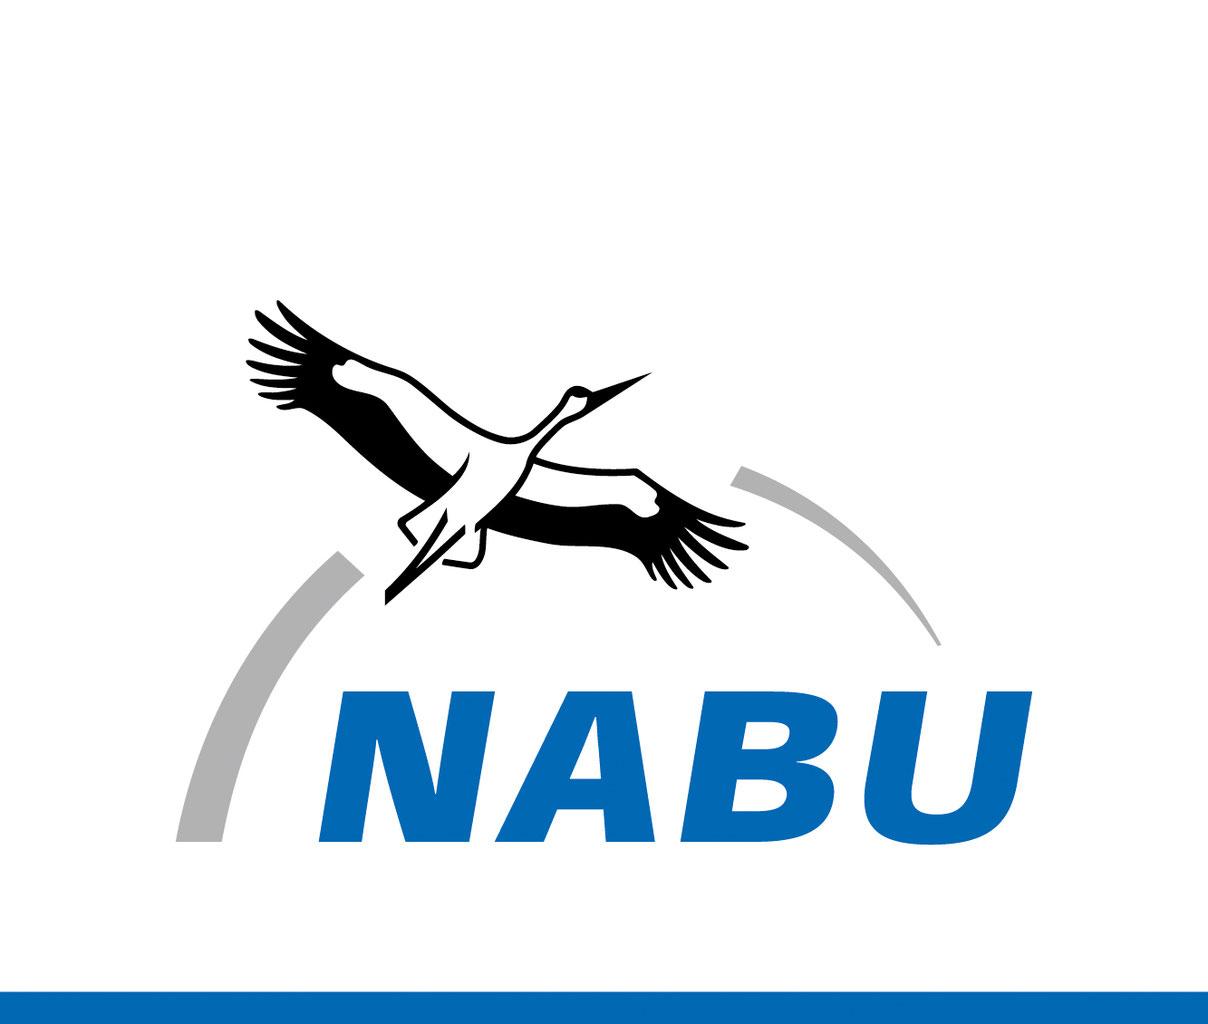 Nabu mitgliedschaft